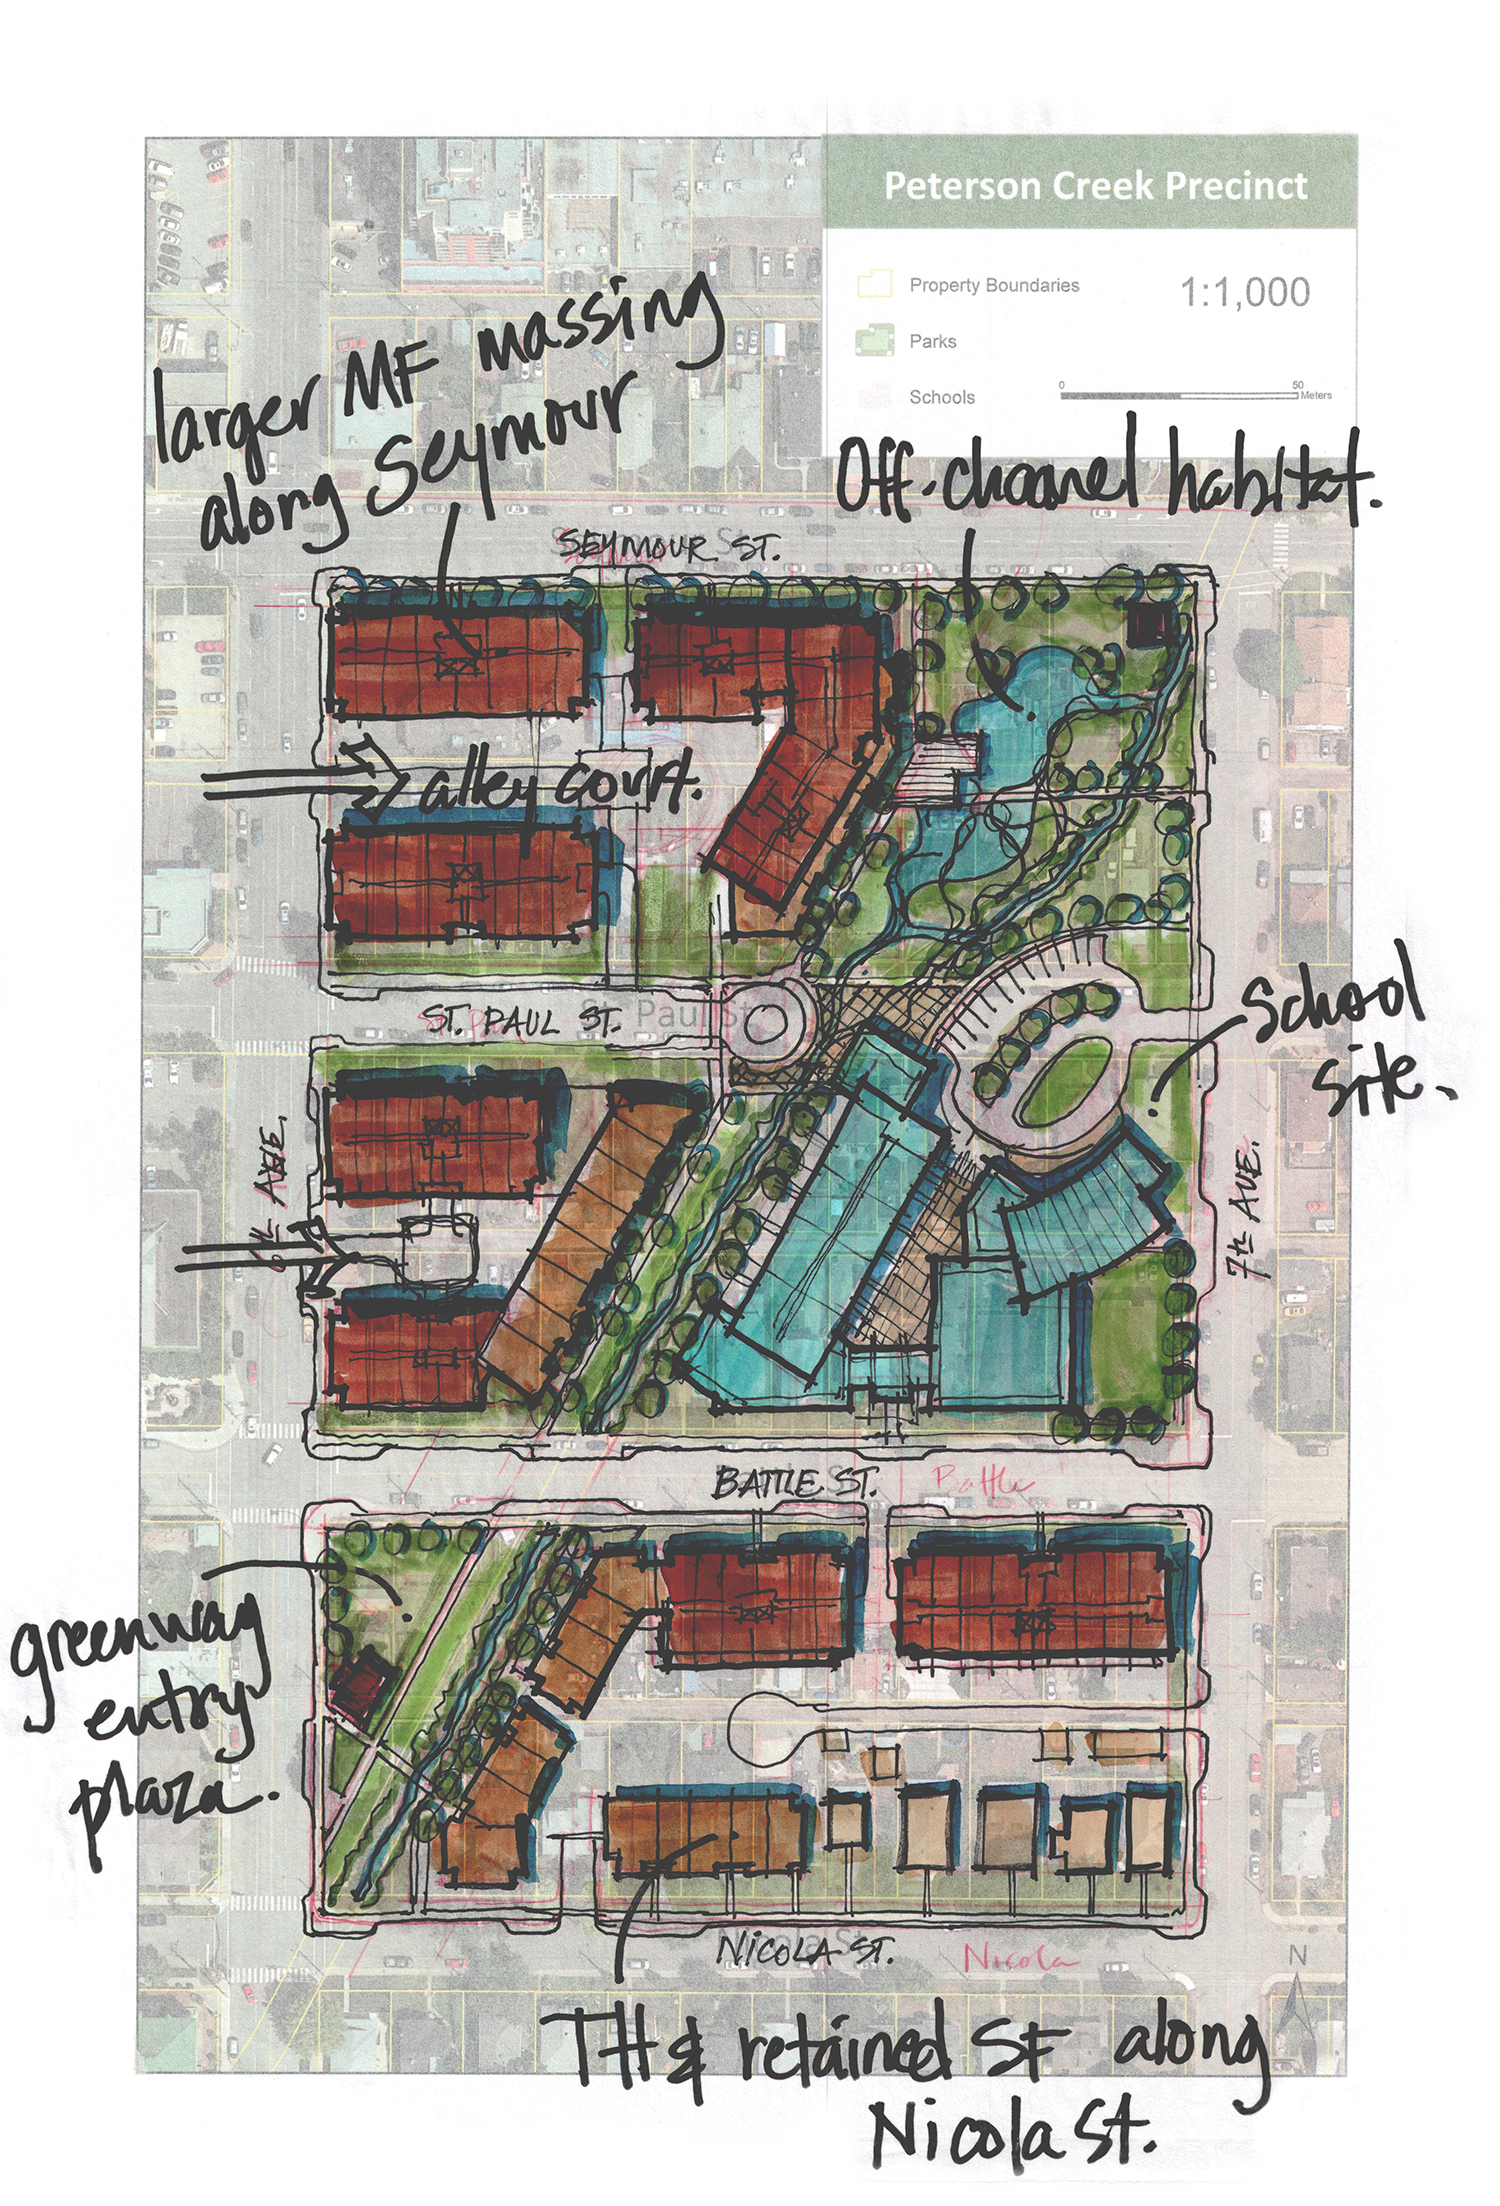 Peterson creek precinct %28site plan%29